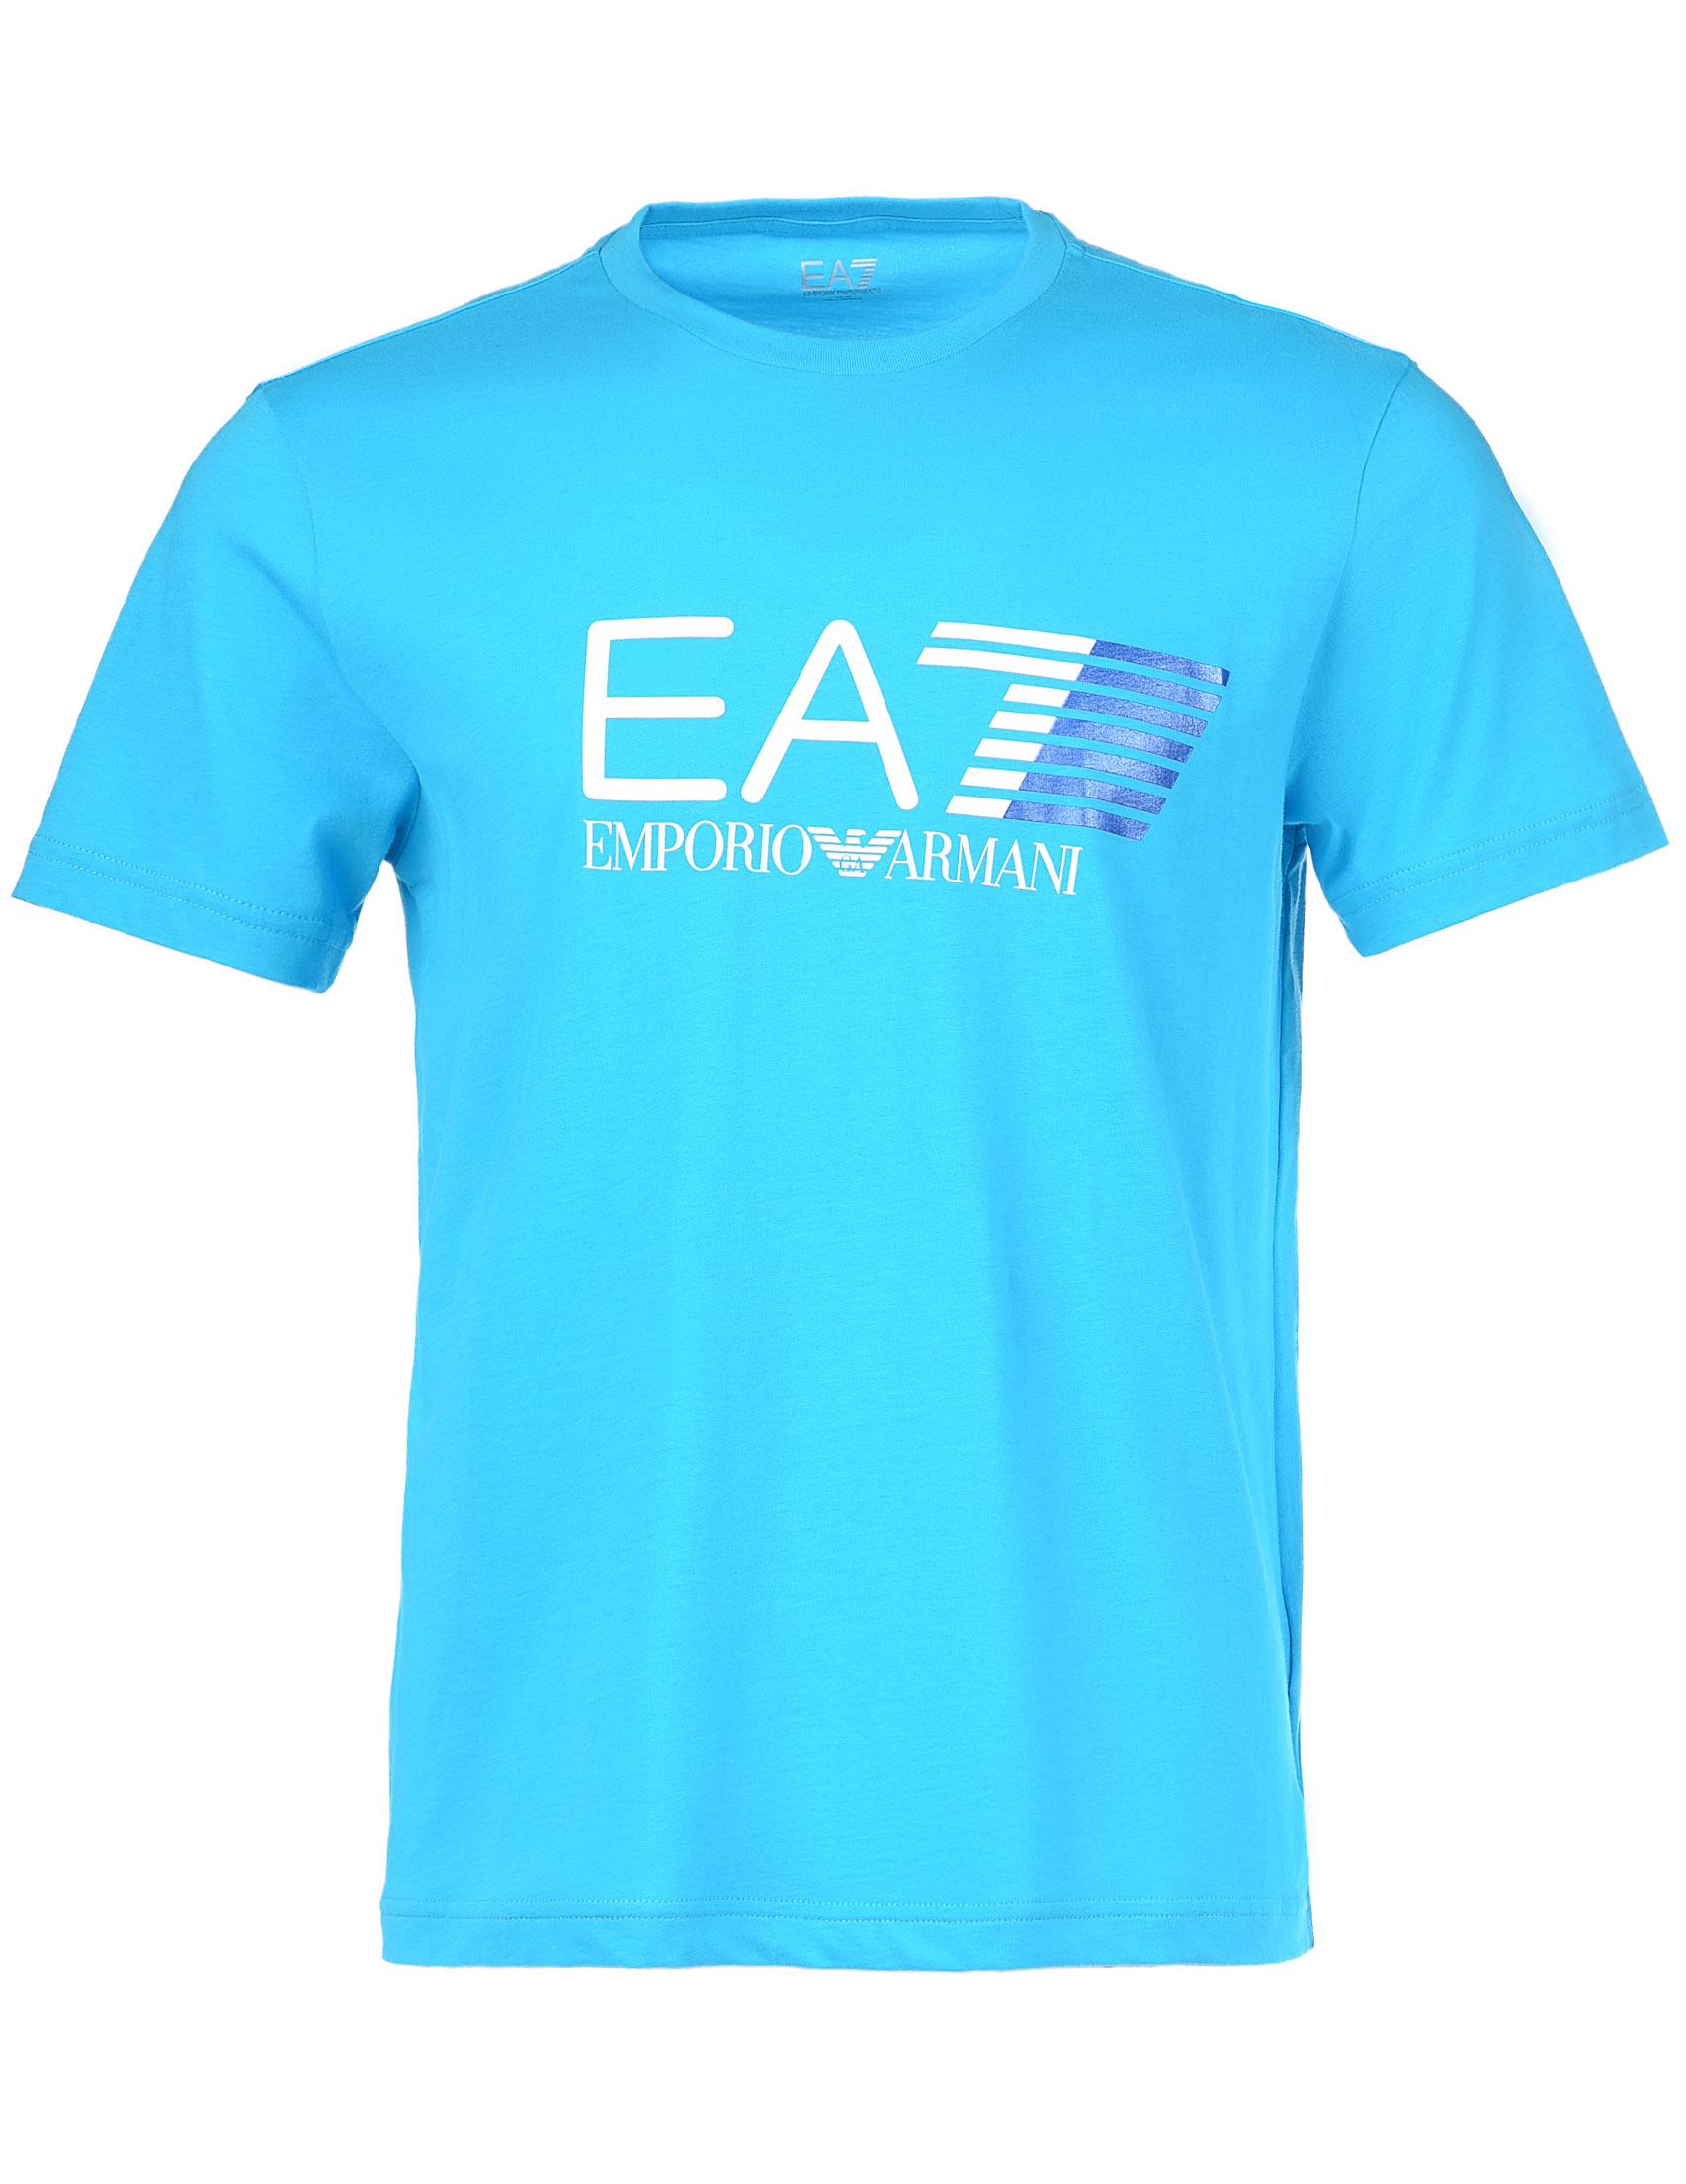 Купить Футболка, EA7 EMPORIO ARMANI, Голубой, 100%Хлопок, Осень-Зима